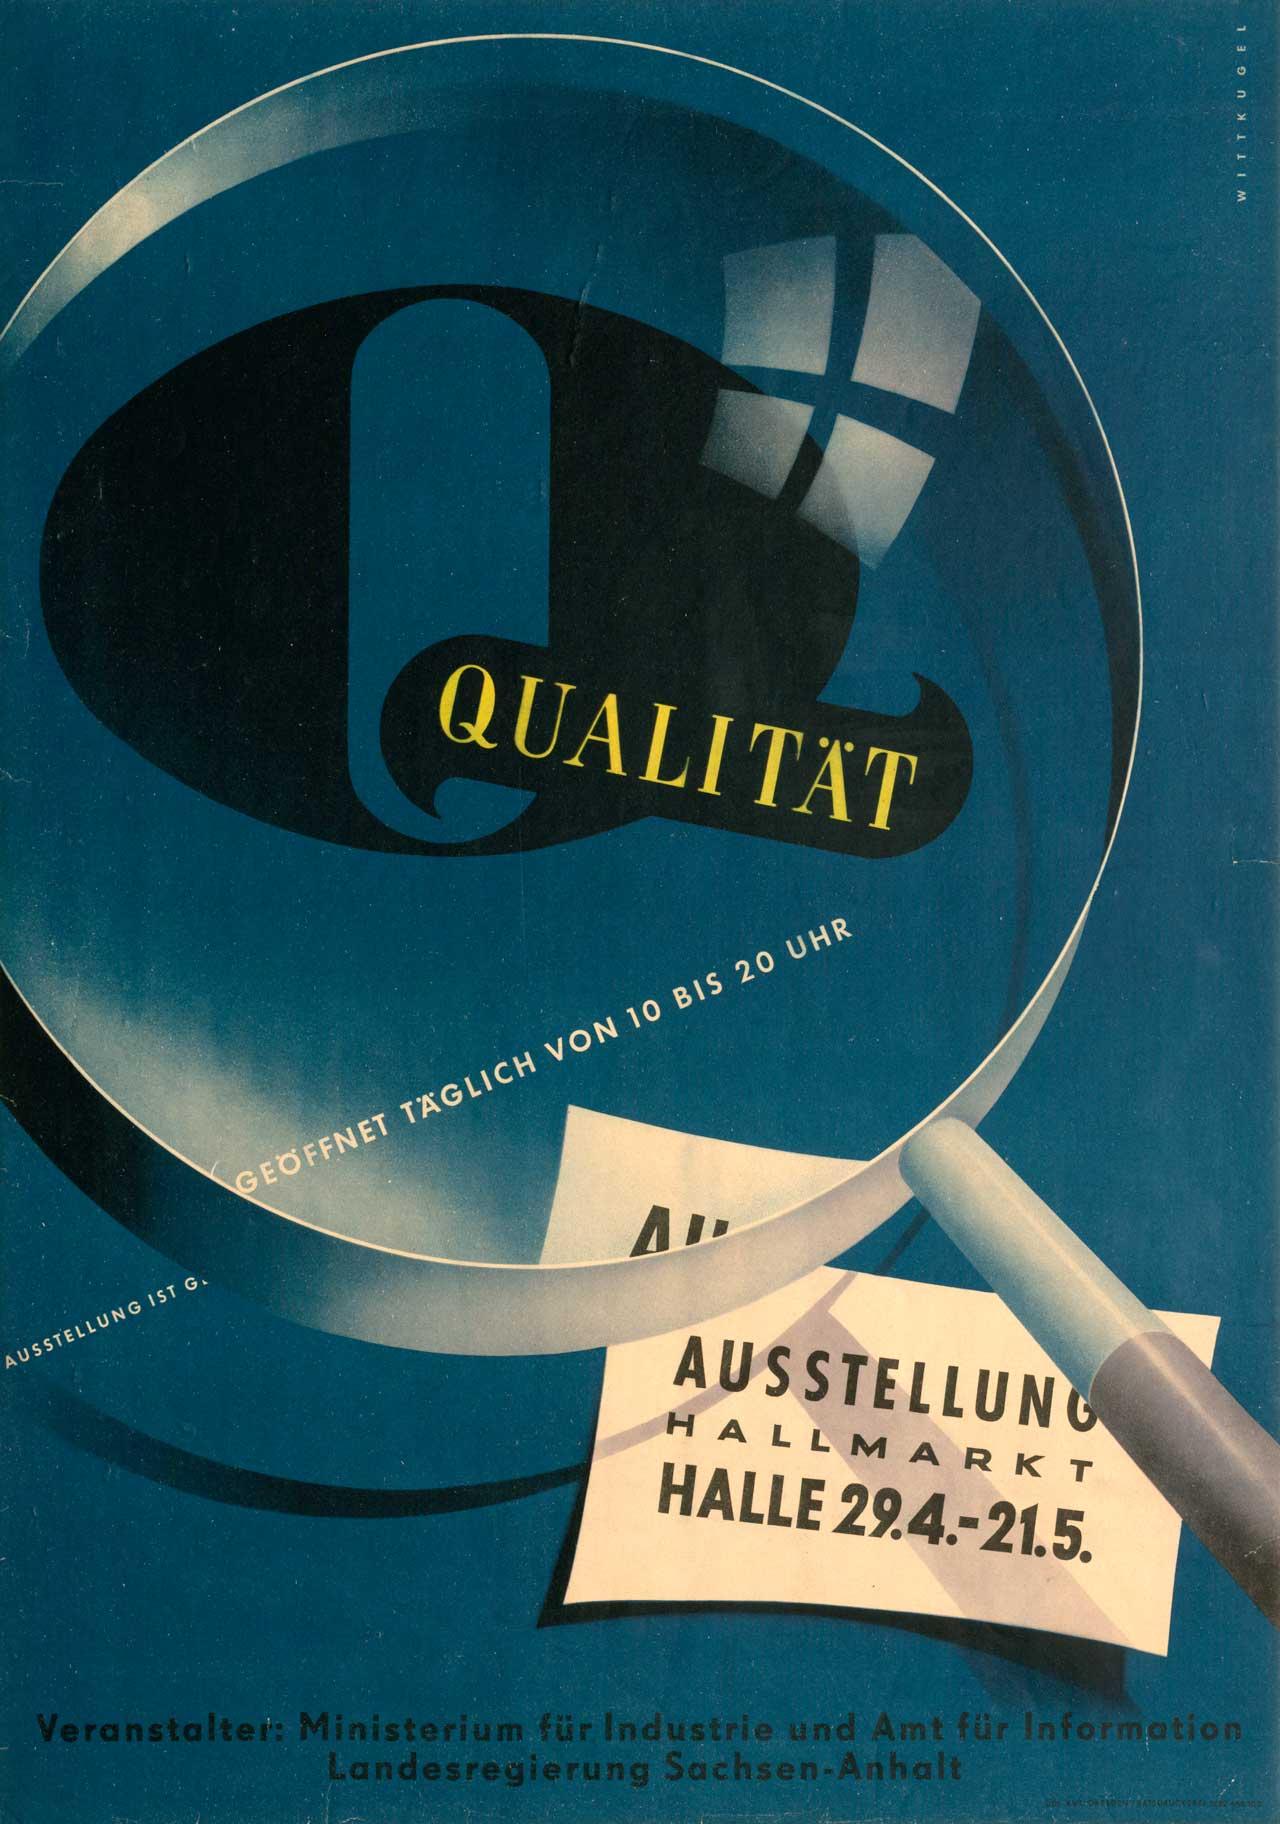 aiga-design-Wittkugel-1950-Qualitaet-01.jpg